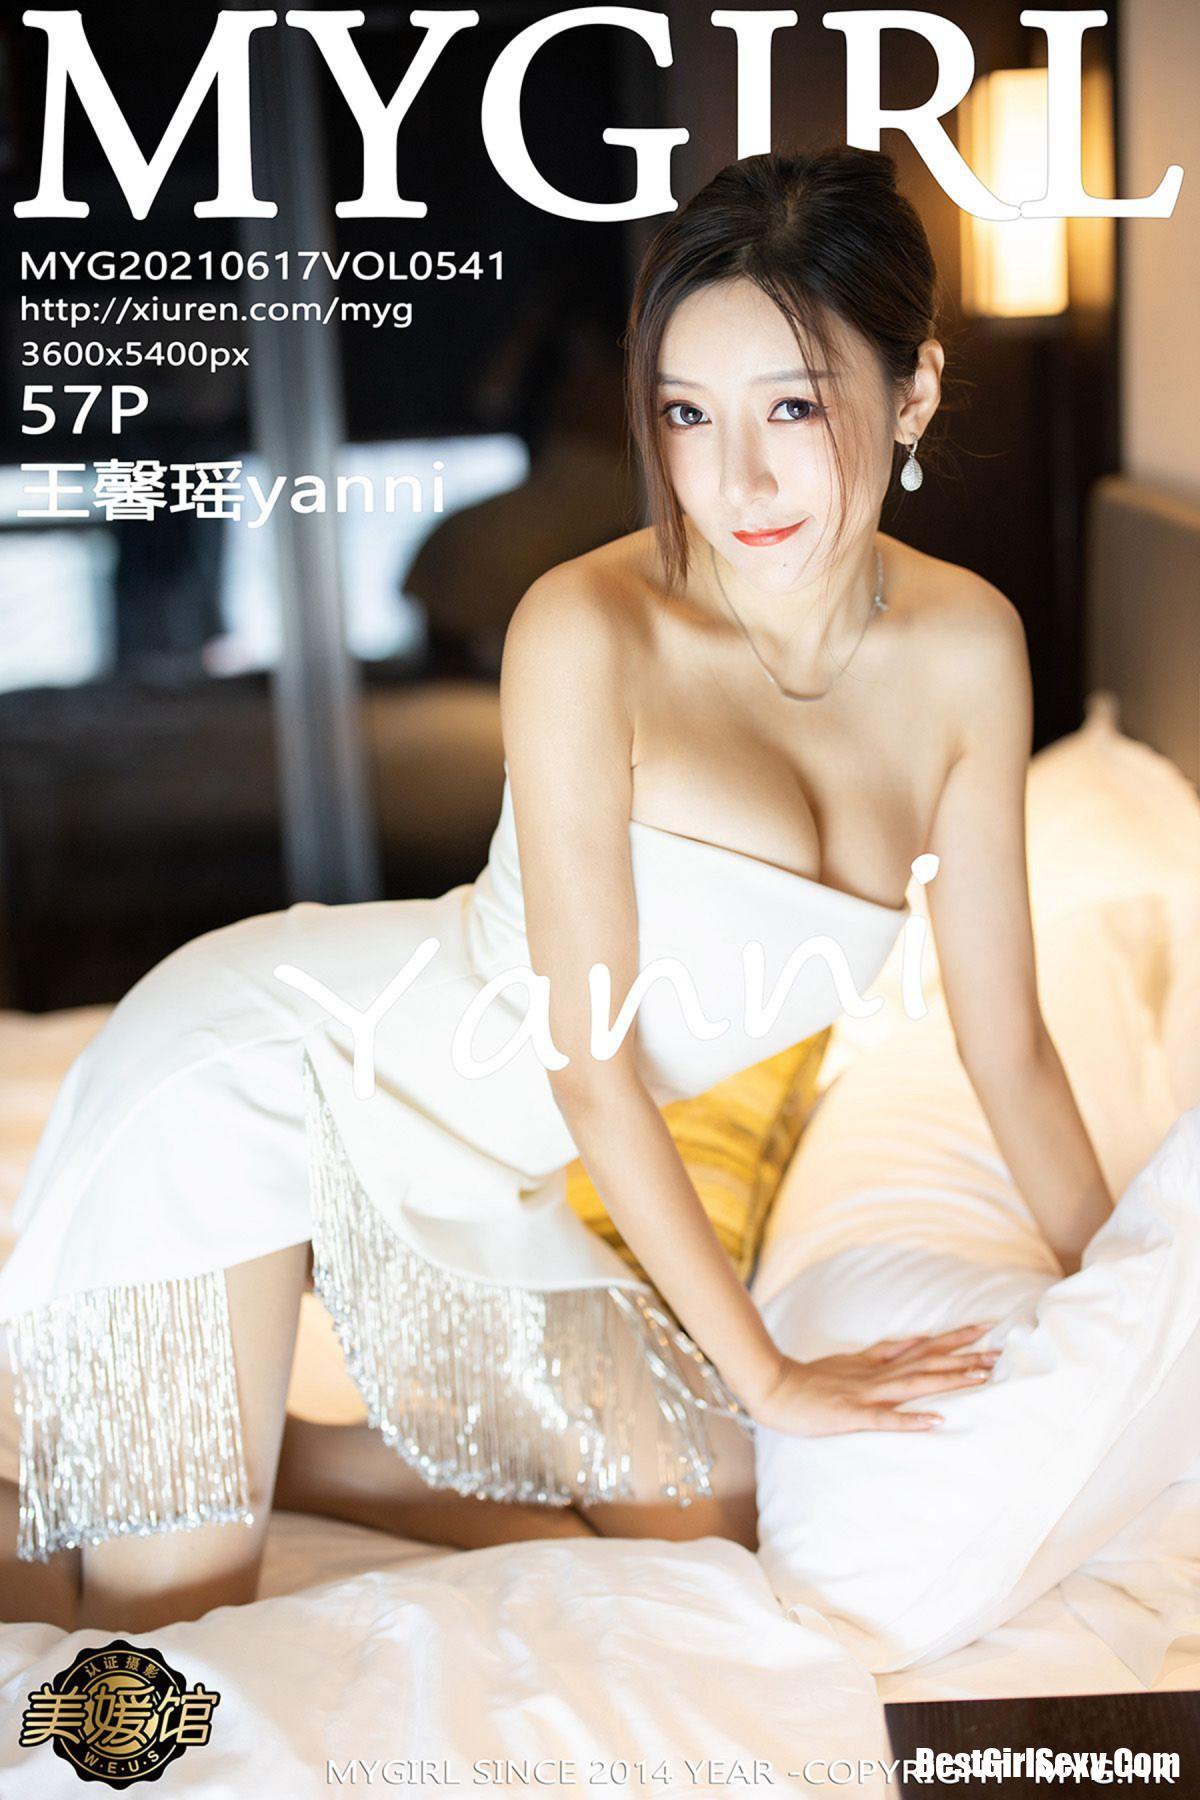 MyGirl美媛馆 Vol.541 Wang Xin Yao 536